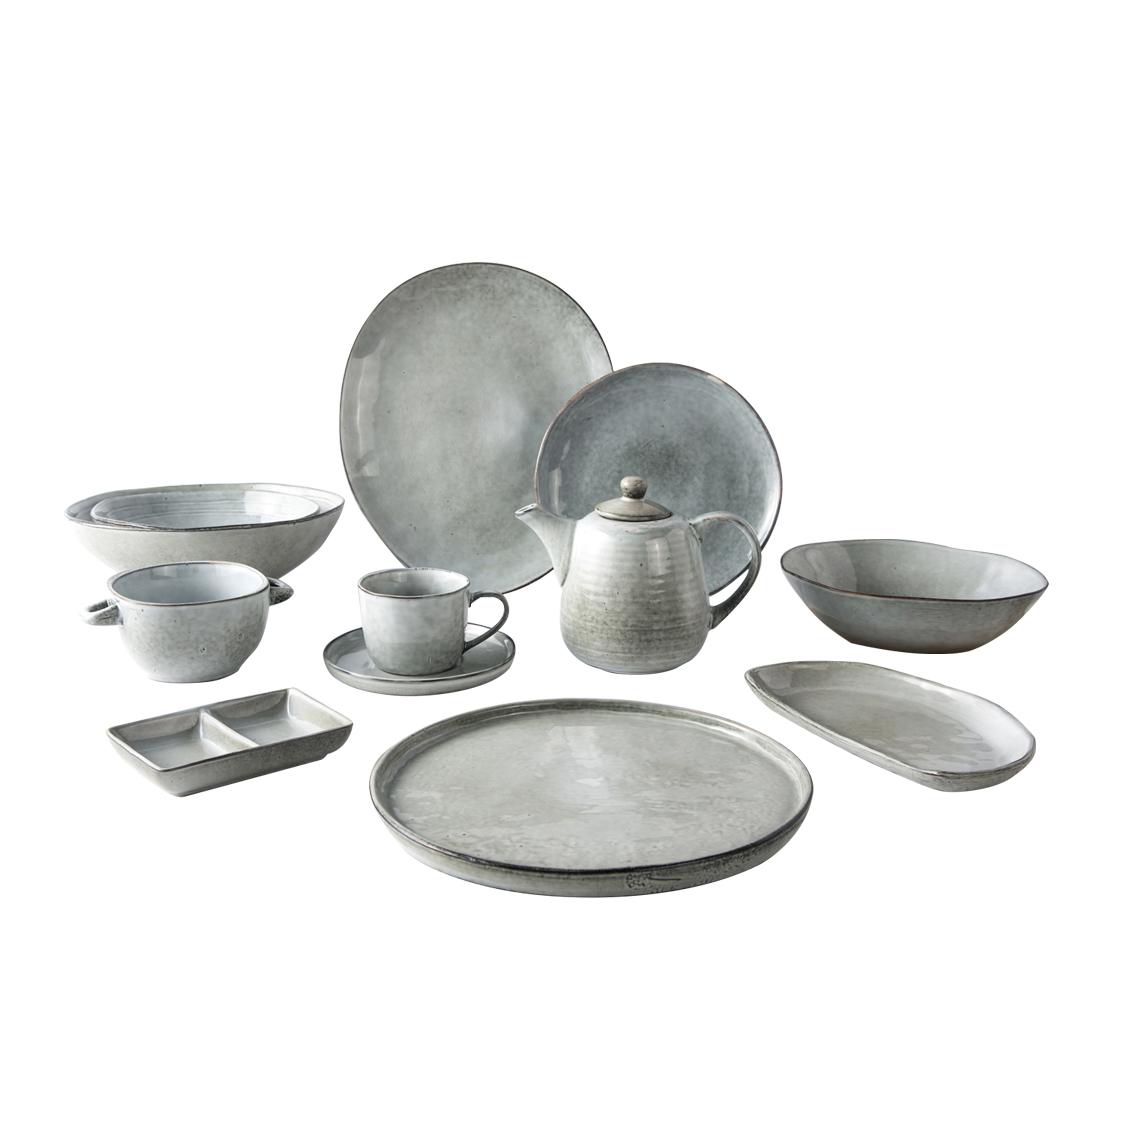 Hotel Tableware Green Indian Restaurant Tableware, Colorful Dinnerware Sets, Color European Style Porcelain Dinnerware Set